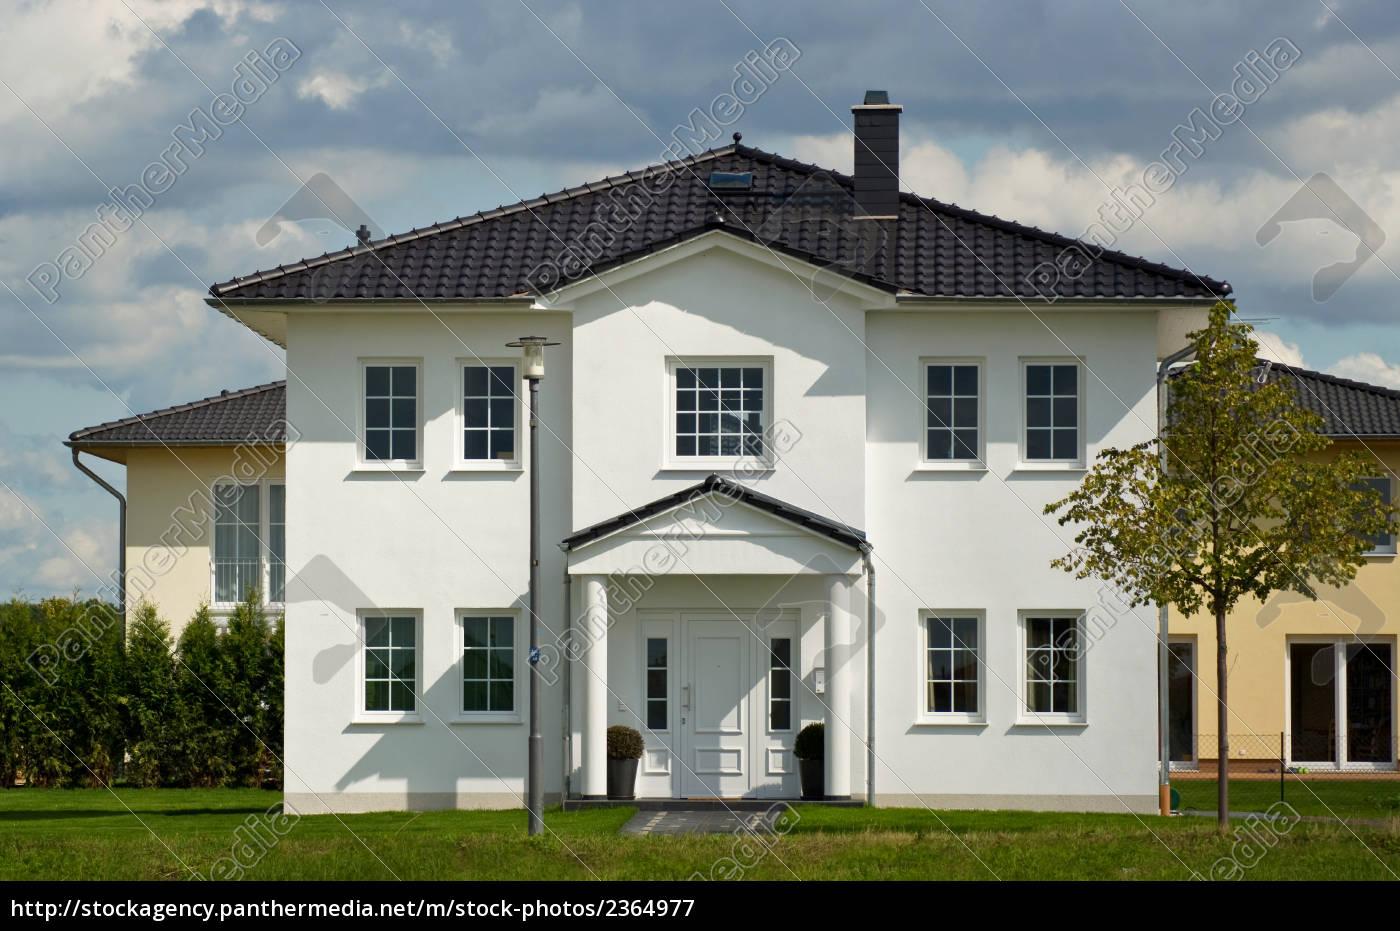 single-family, house, the, house, with, a, garden - 2364977